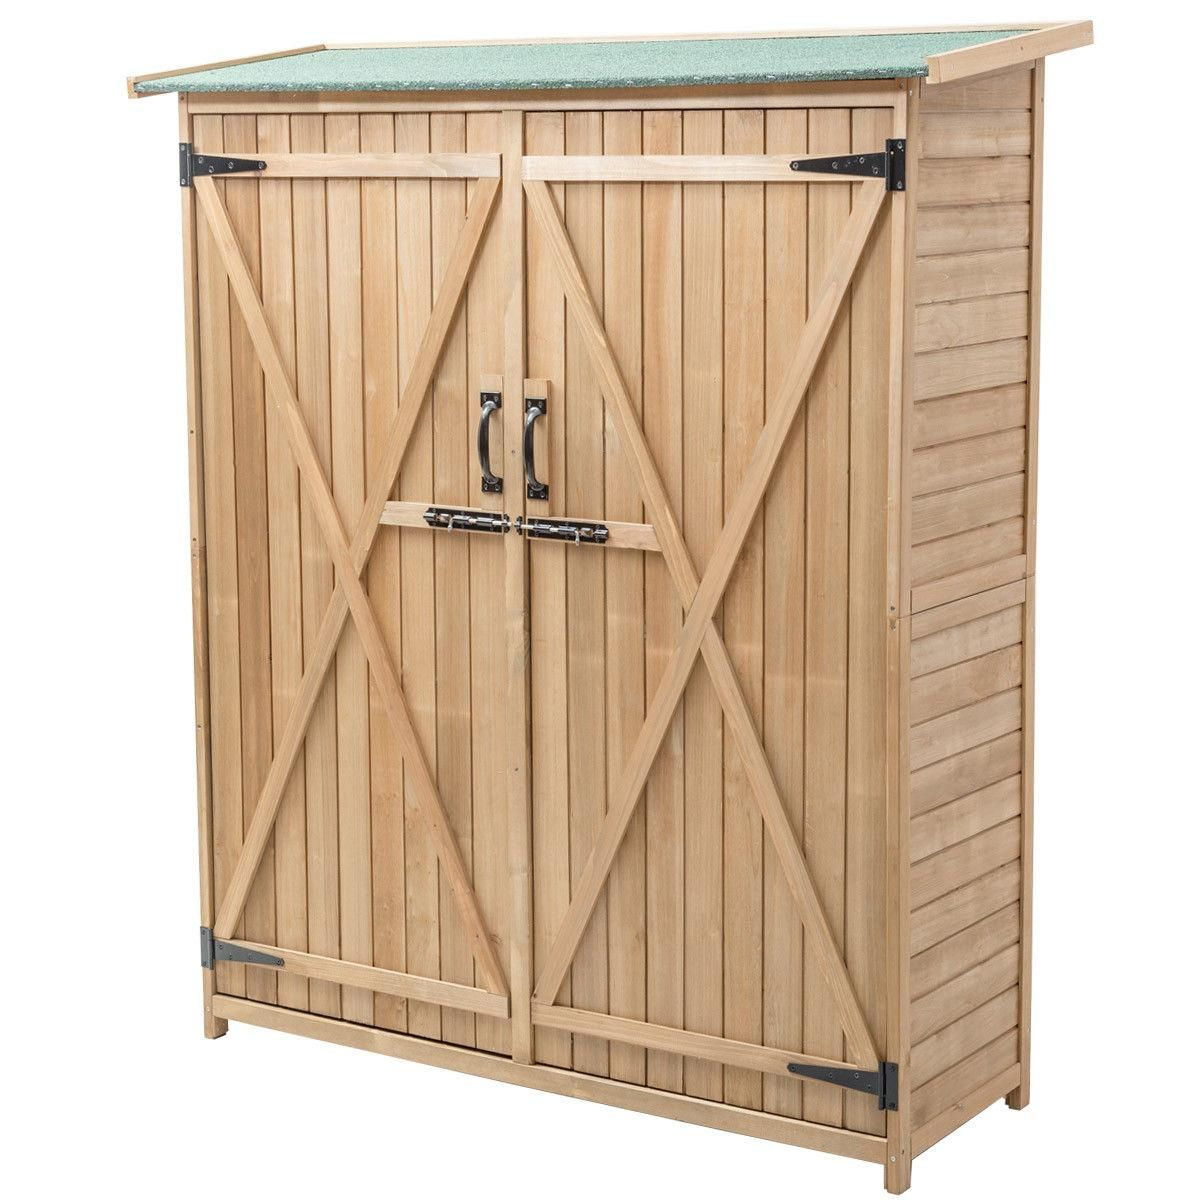 Gymax Garden Outdoor Wooden Storage Shed Cabinet Double Doors Fir Wood Lockers